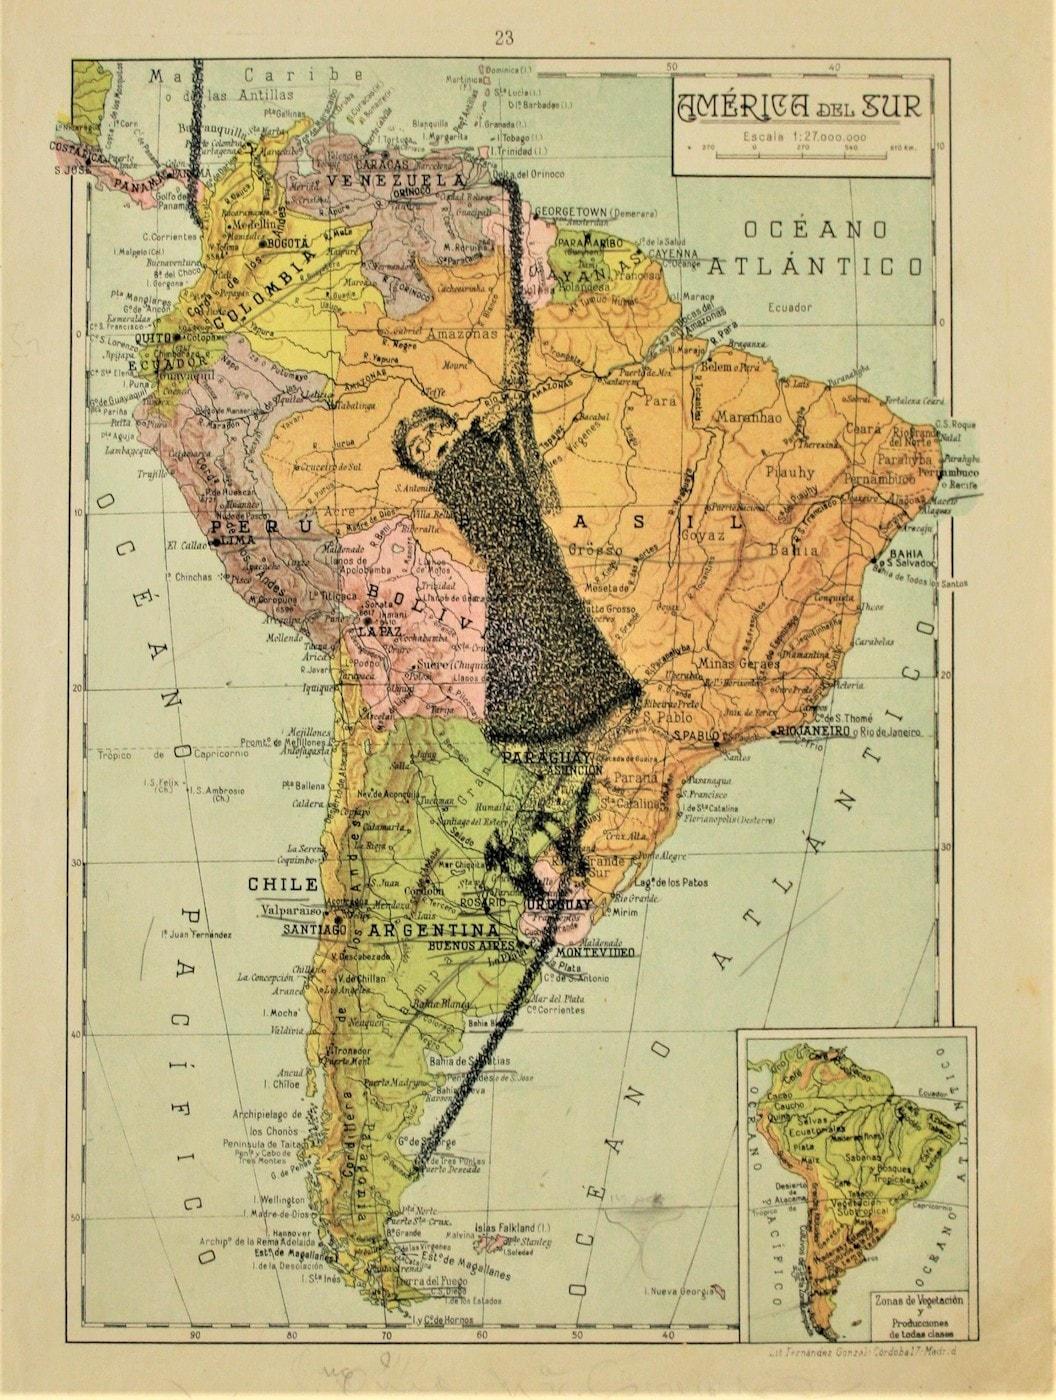 Gonzalo-Elvira-Sobre-el-abismo2018-Tinta-sobre-mapa-36-x-24-cm-1500€